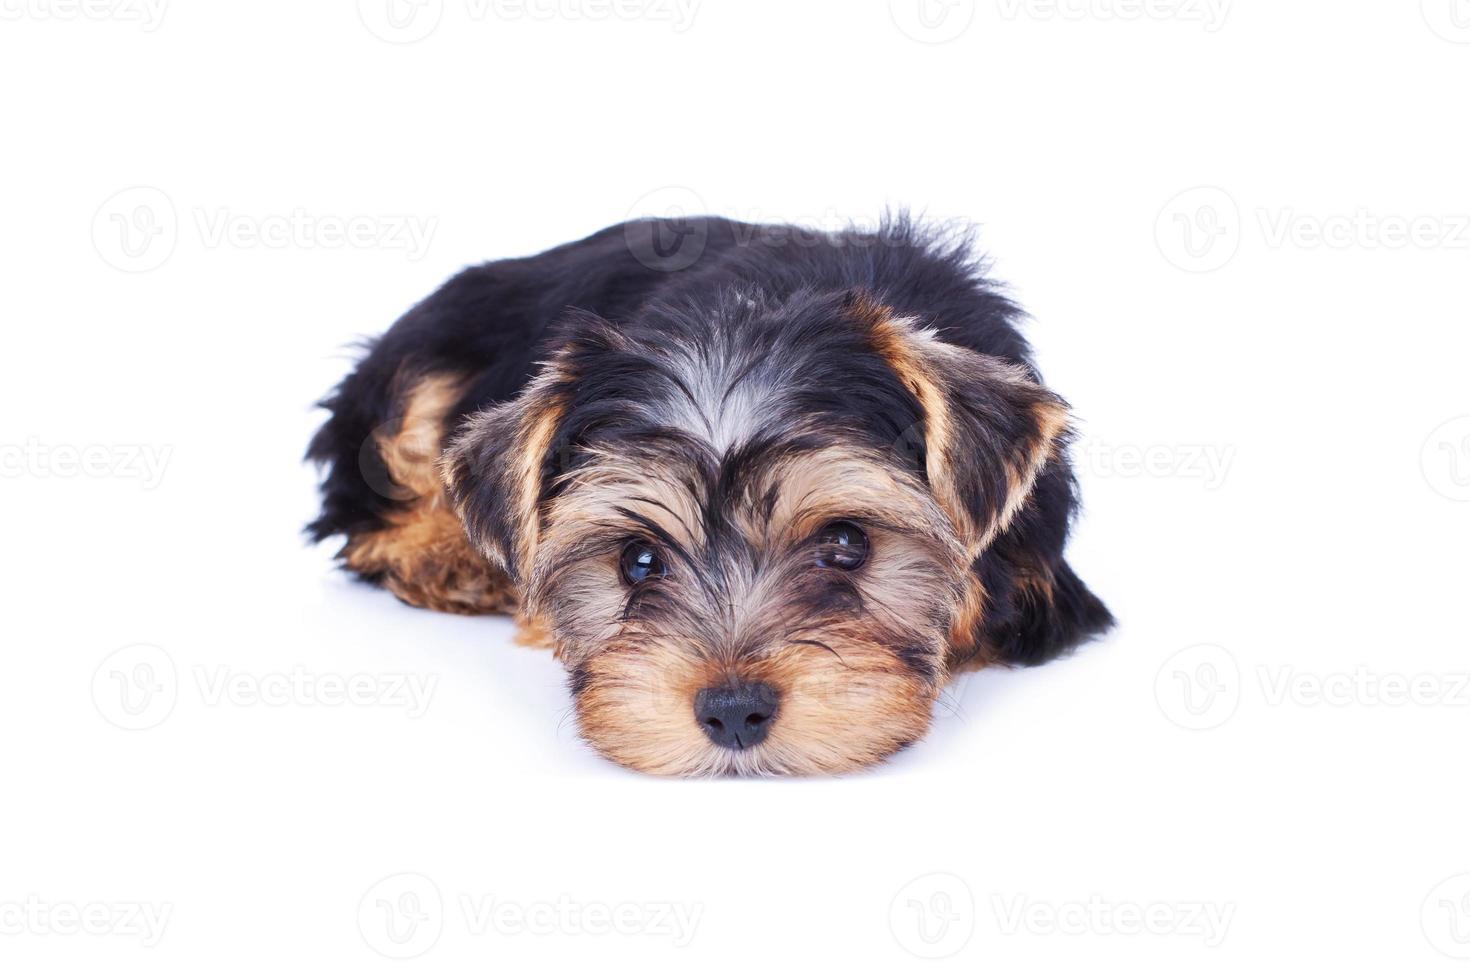 adorable yorkshire cachorro relajante foto